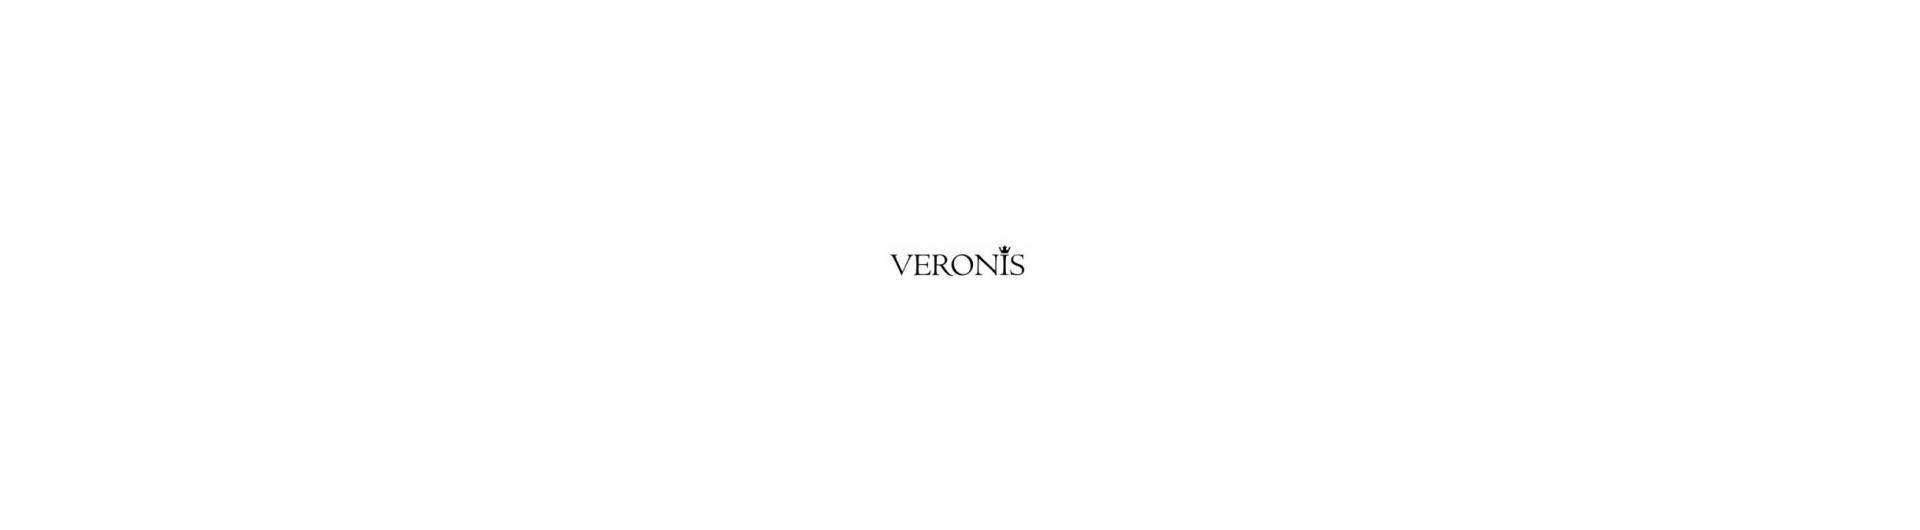 VERONIS